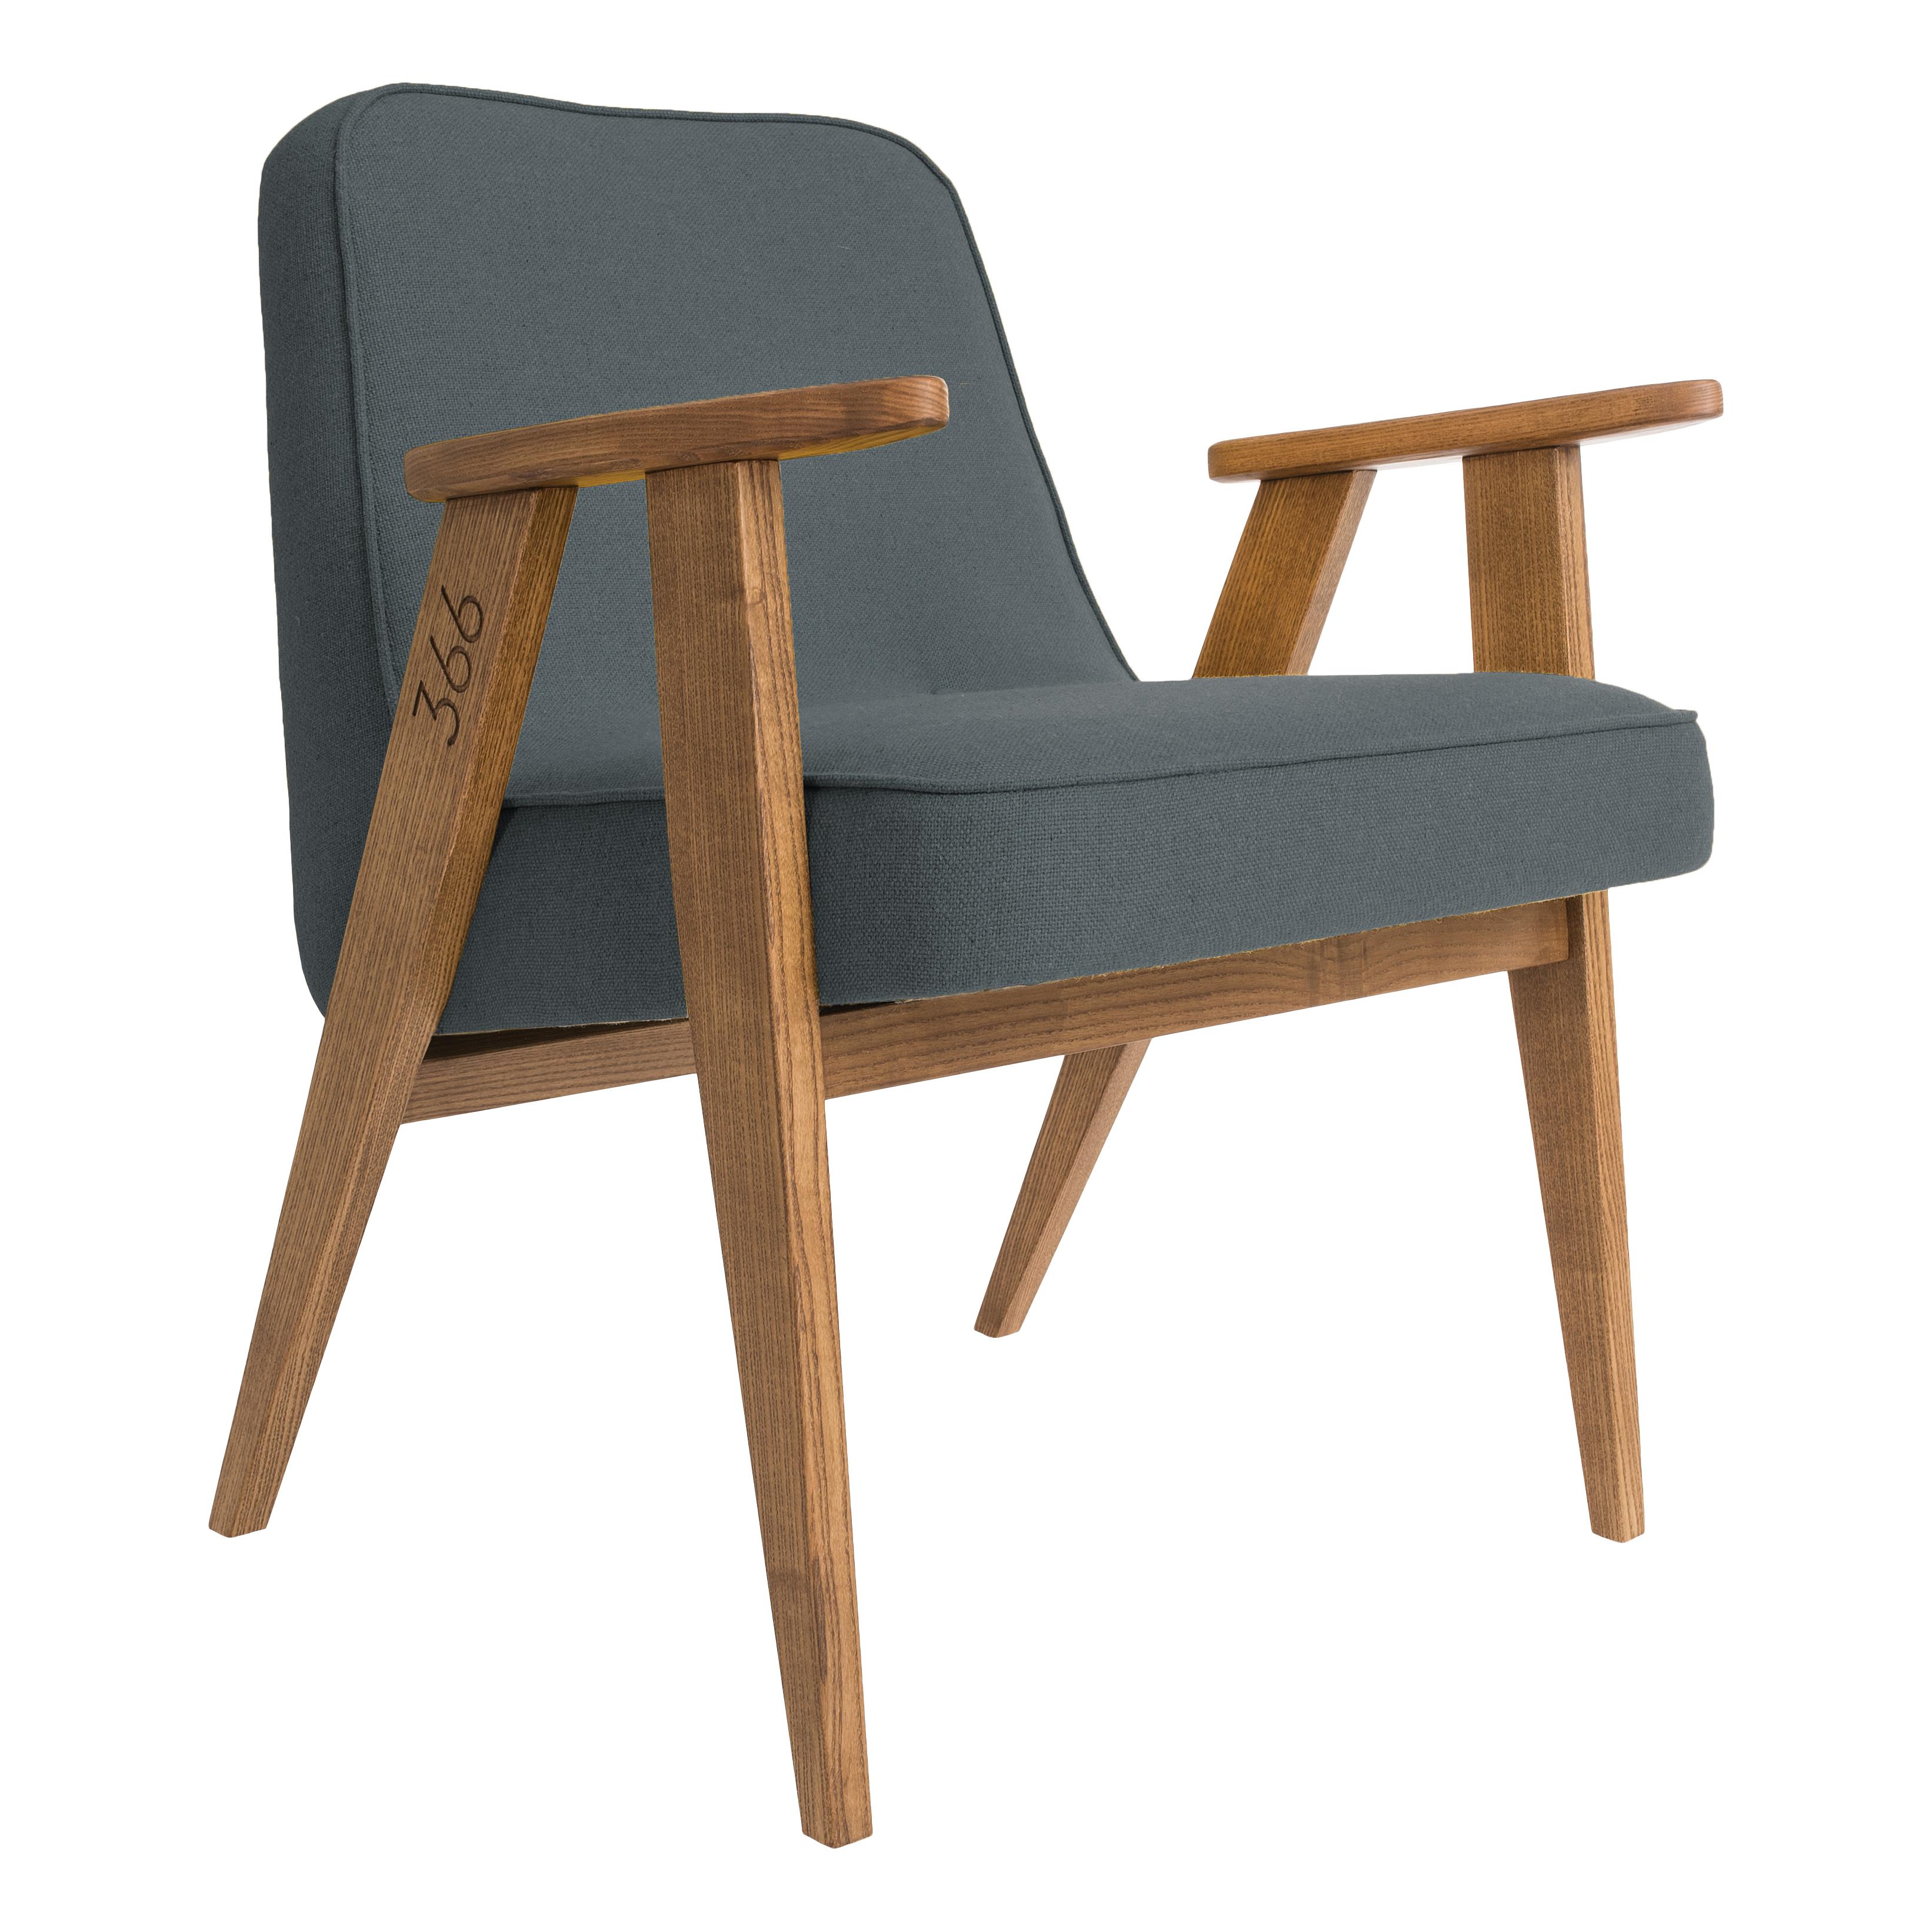 366_Concept_-_366_easy_chair_-_Wool_06_Light Blue_-_Oak